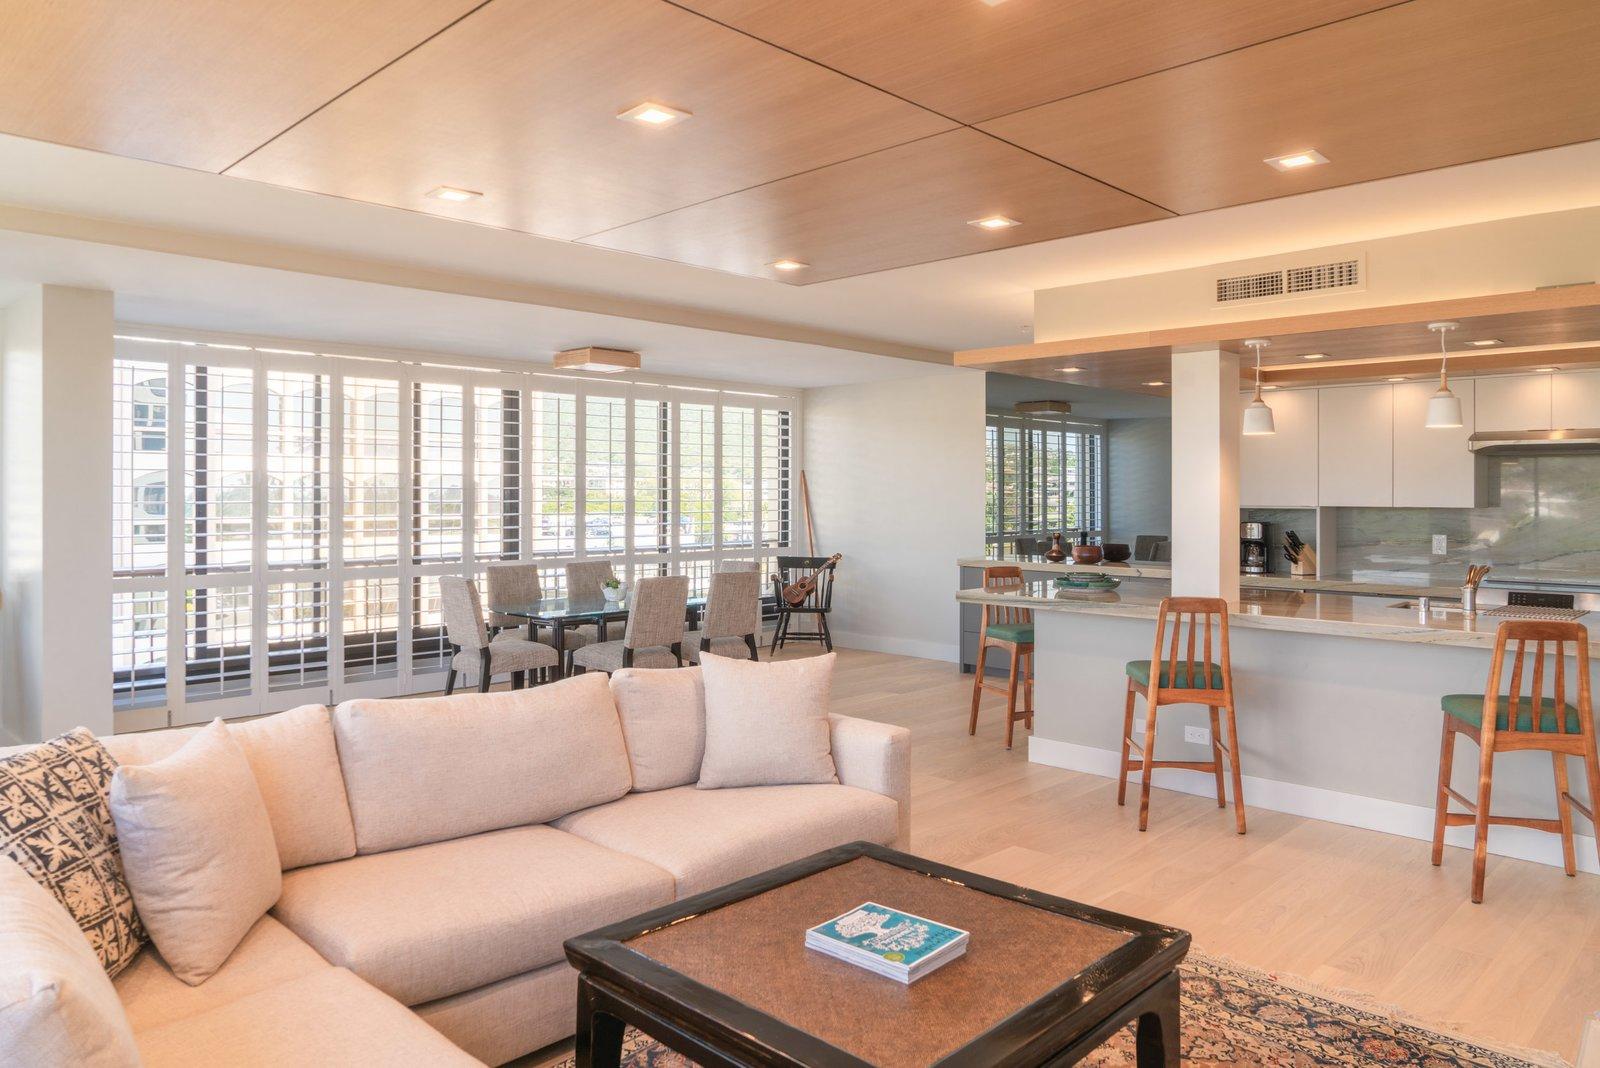 Living Room, Ceiling Lighting, Accent Lighting, Recessed Lighting, Light Hardwood Floor, and Pendant Lighting  Scott Residence by District Architecture + Design